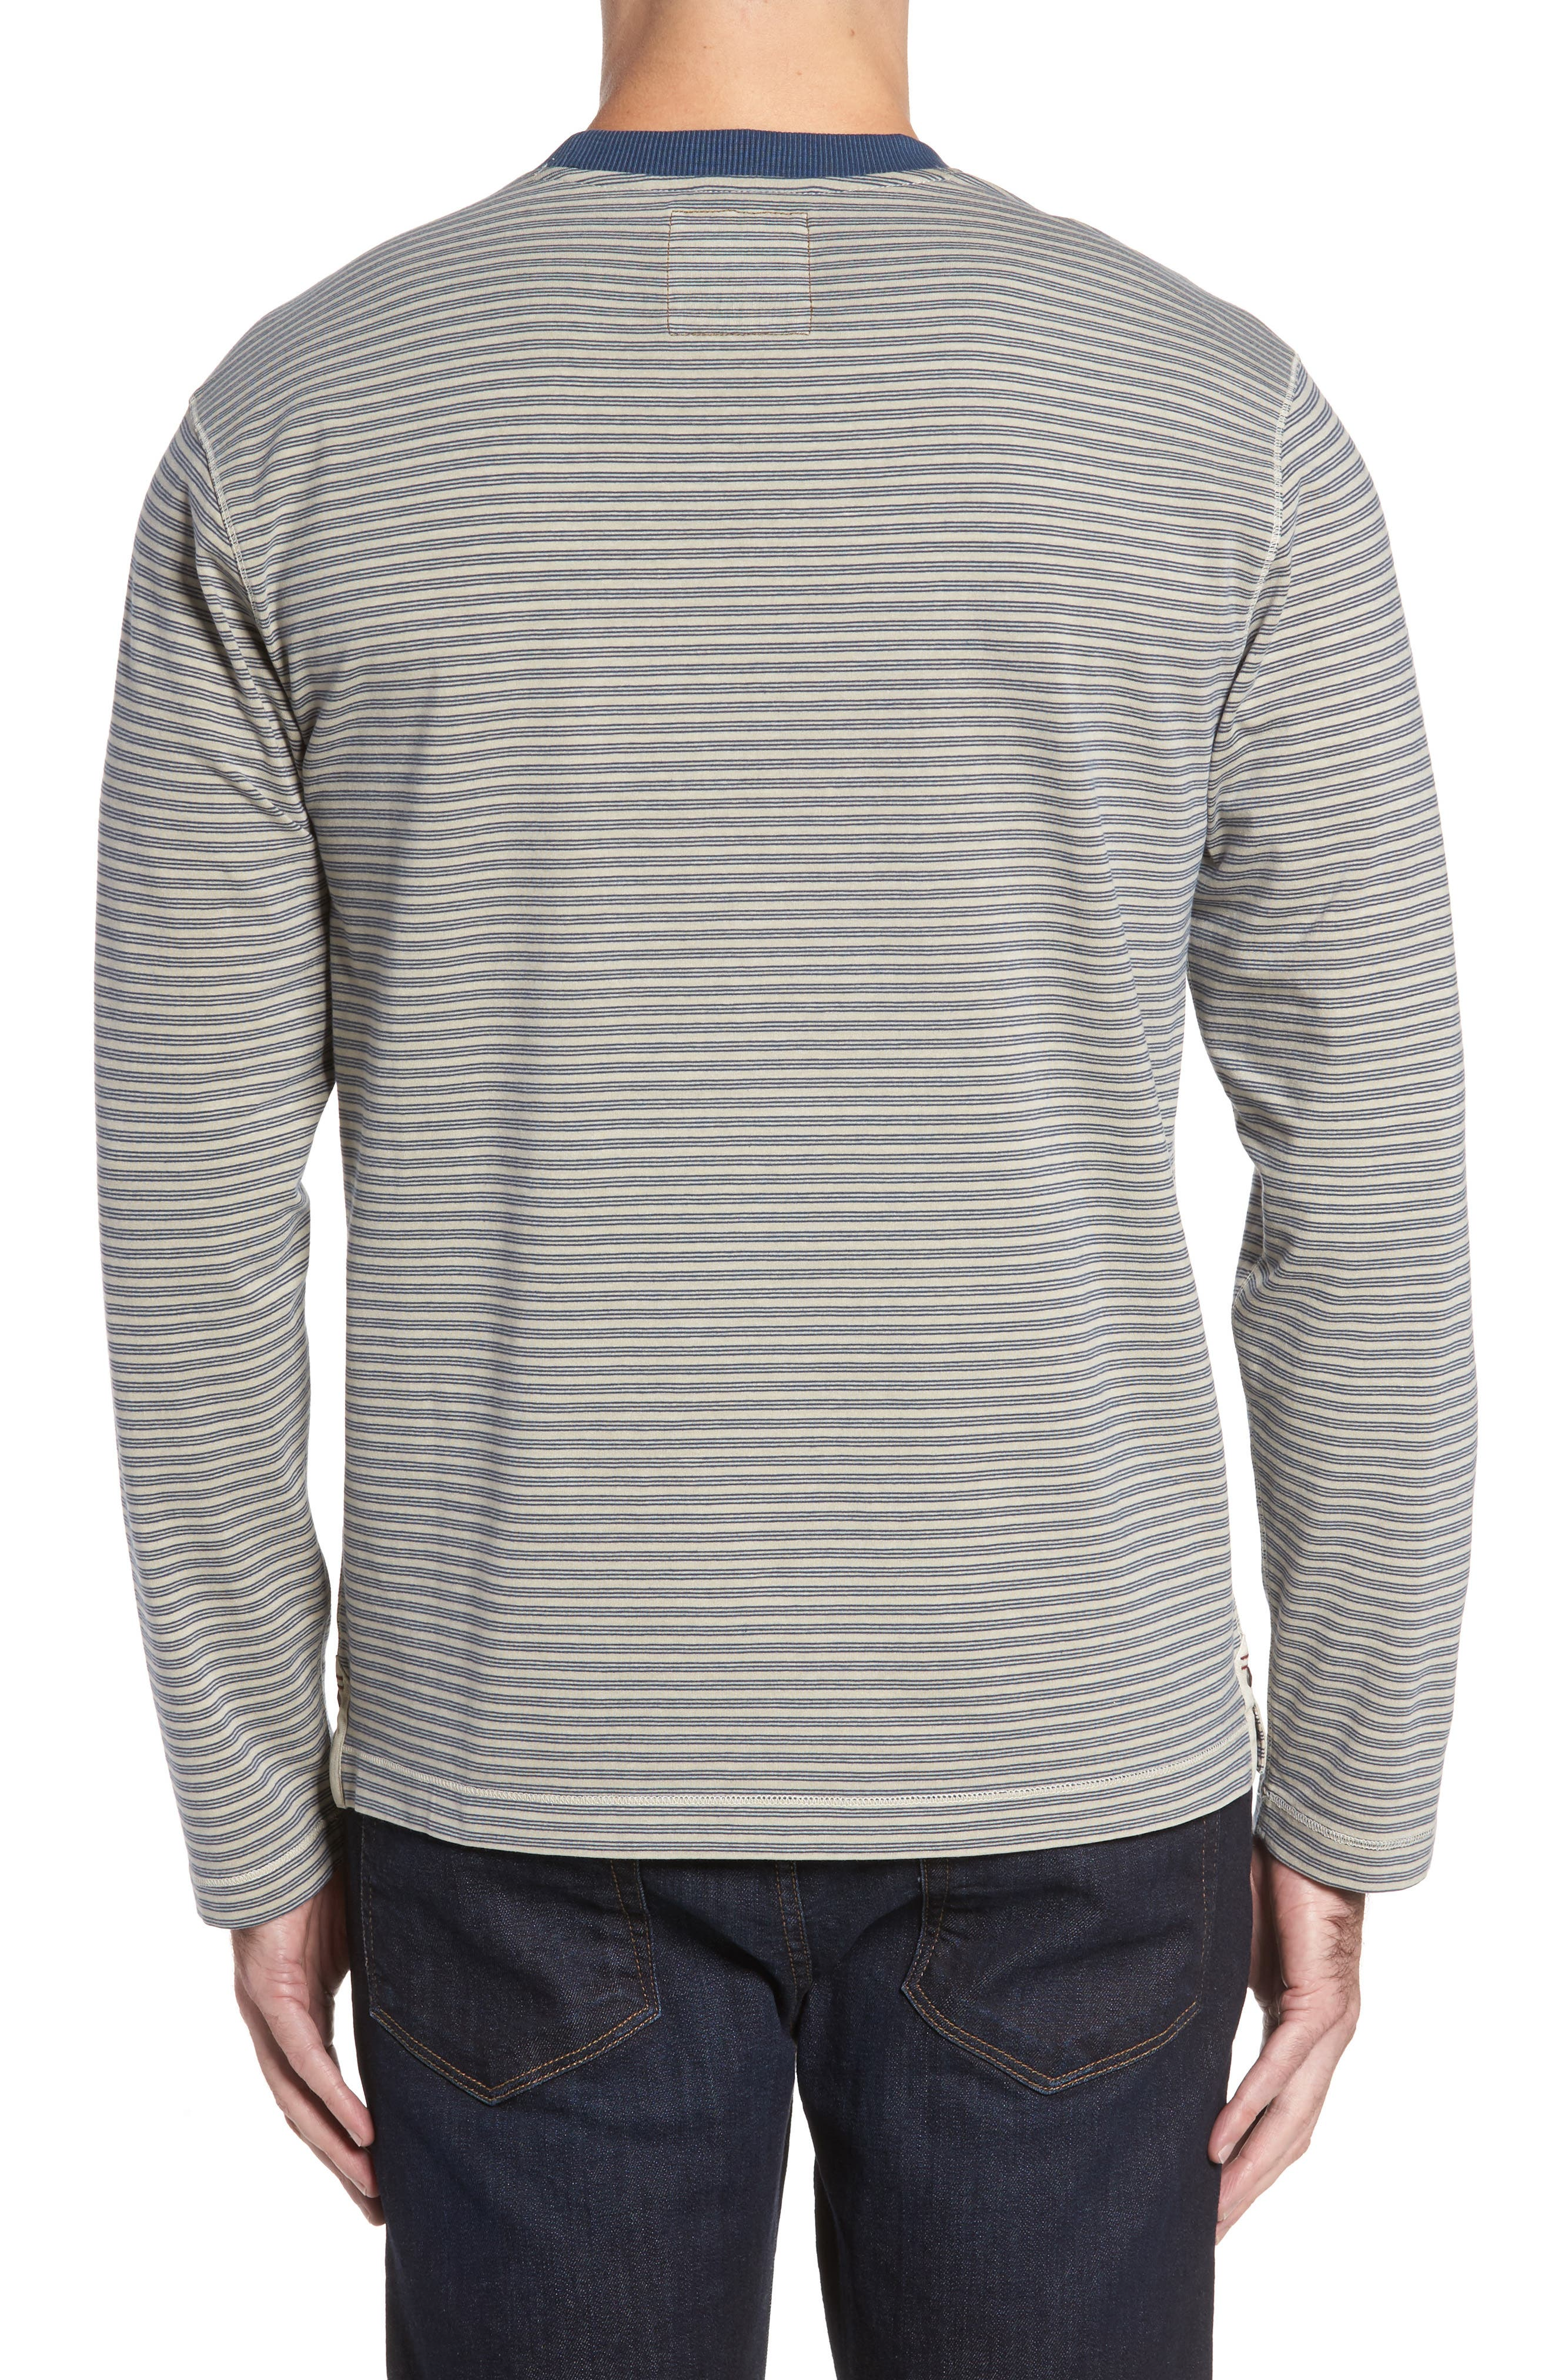 Iverson Long Sleeve Striped T-Shirt,                             Alternate thumbnail 2, color,                             290